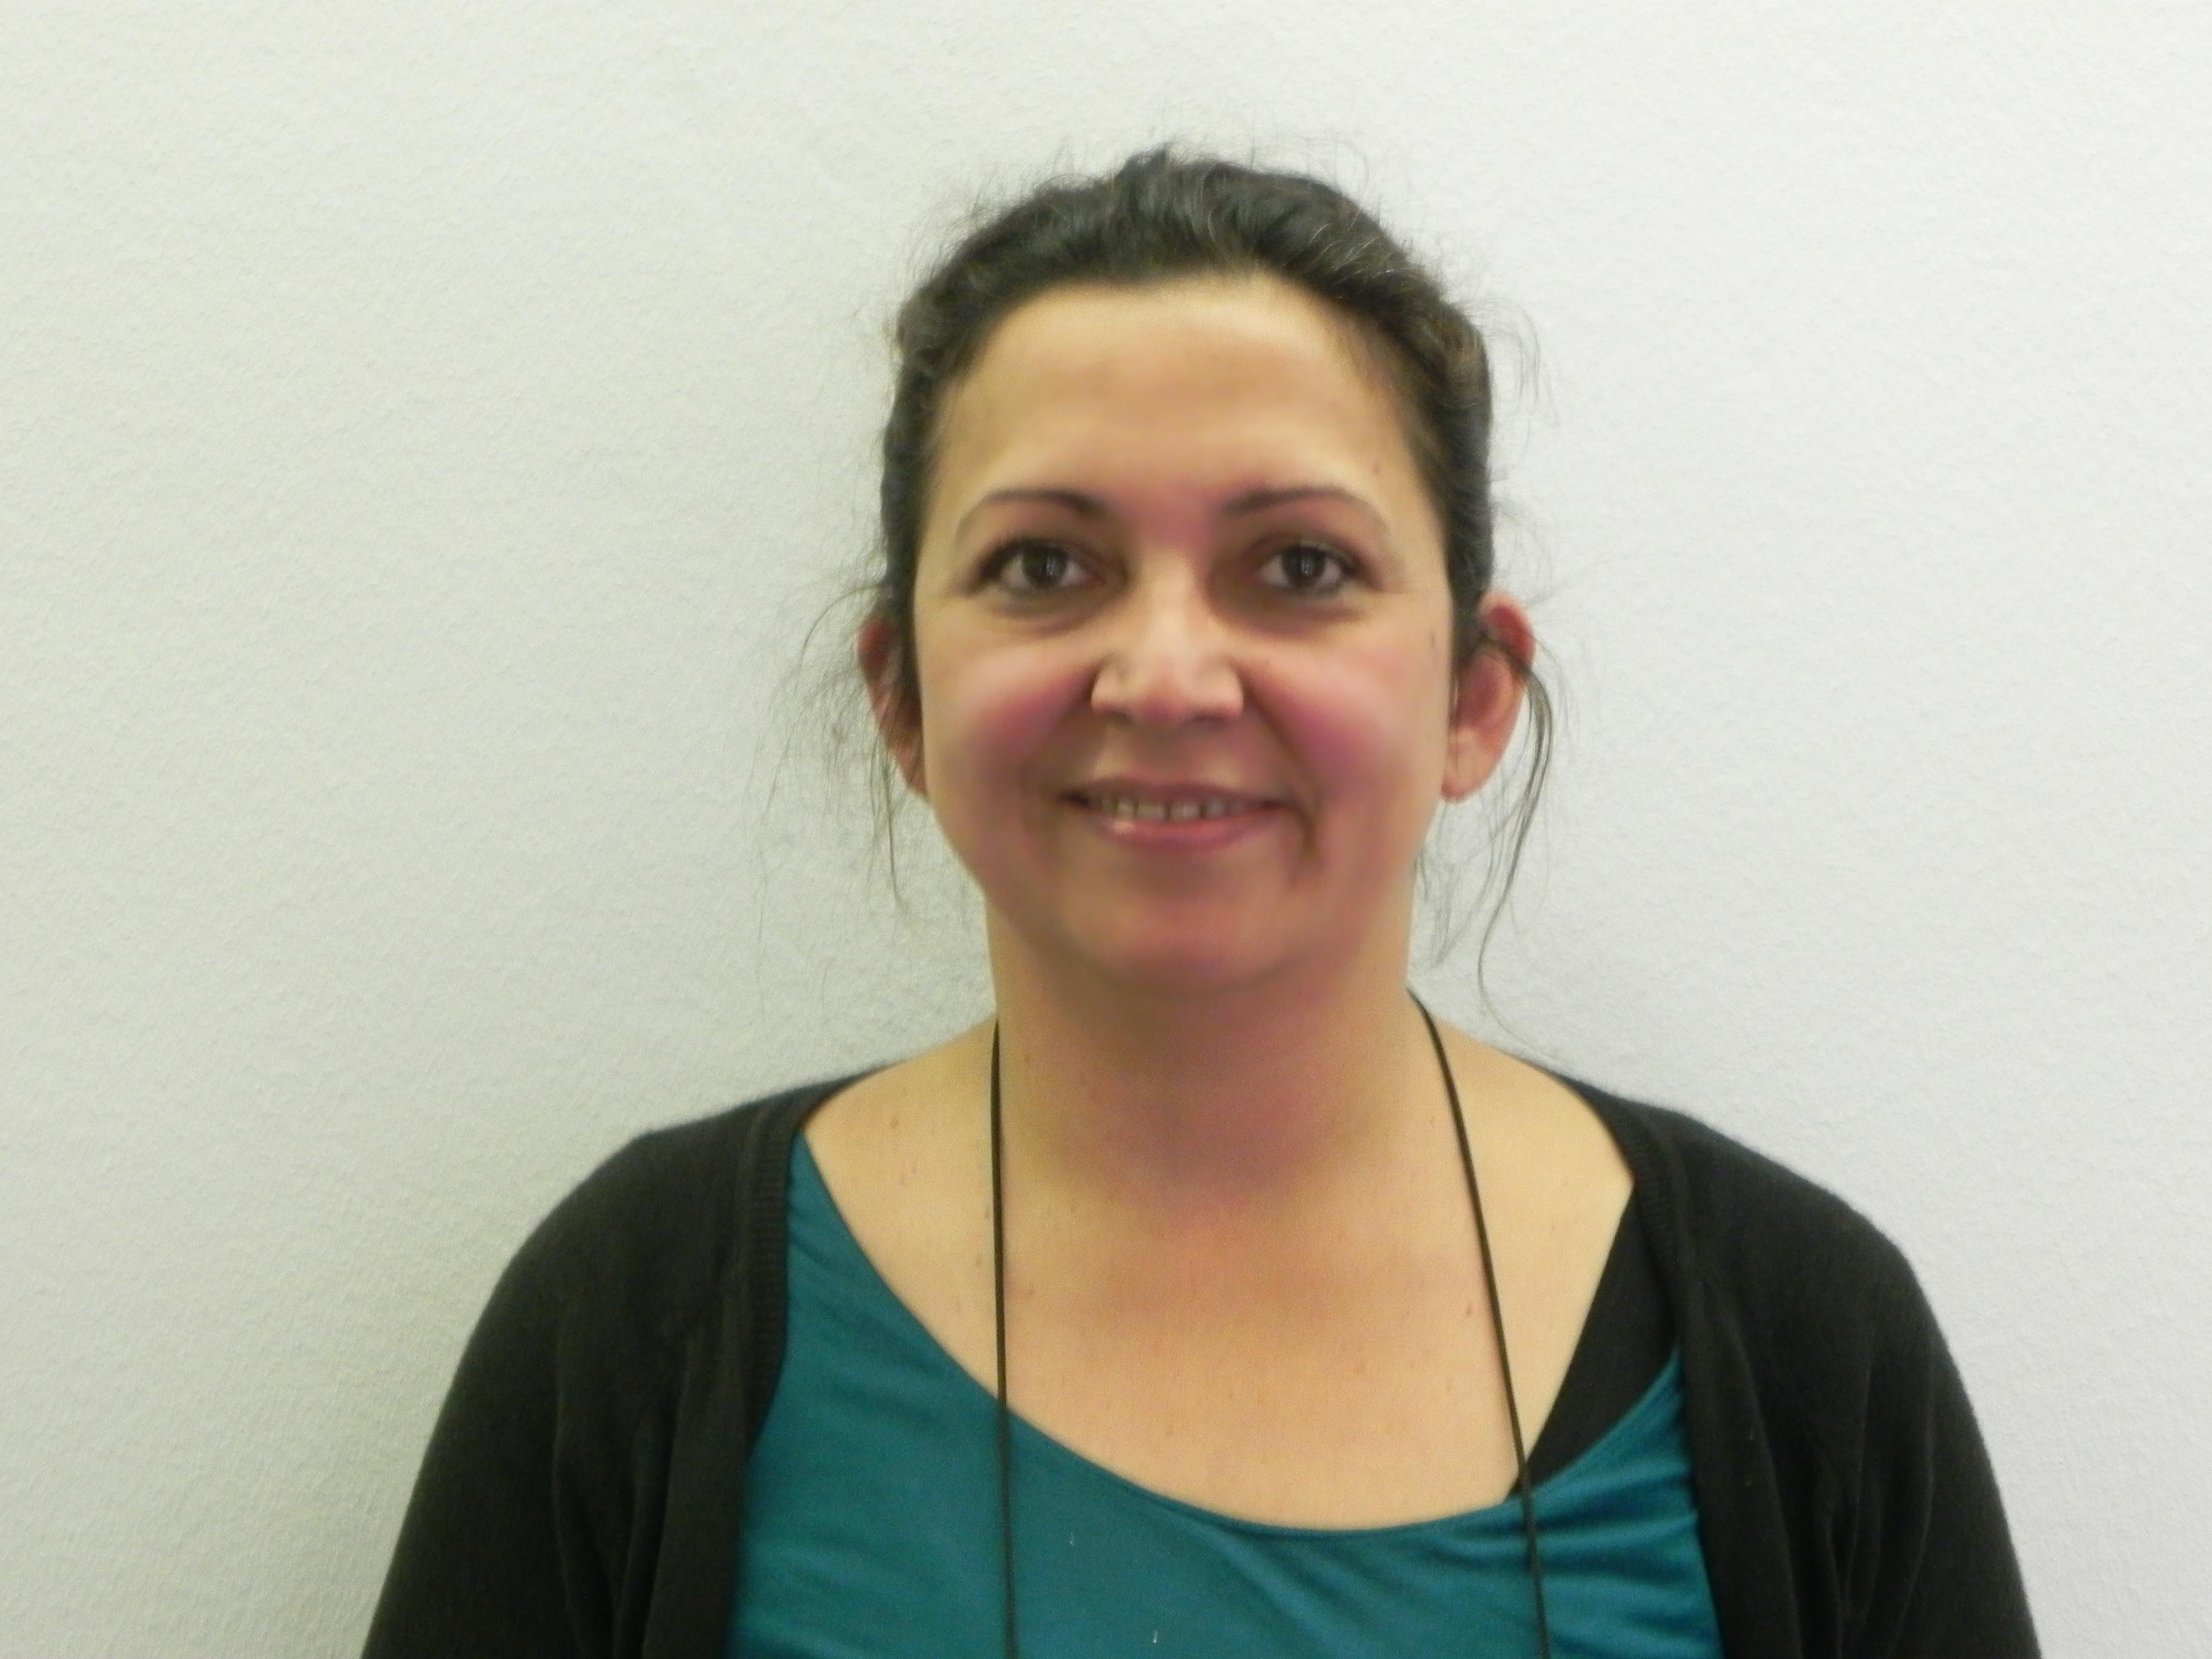 Ángela Patricia Vega Landaeta